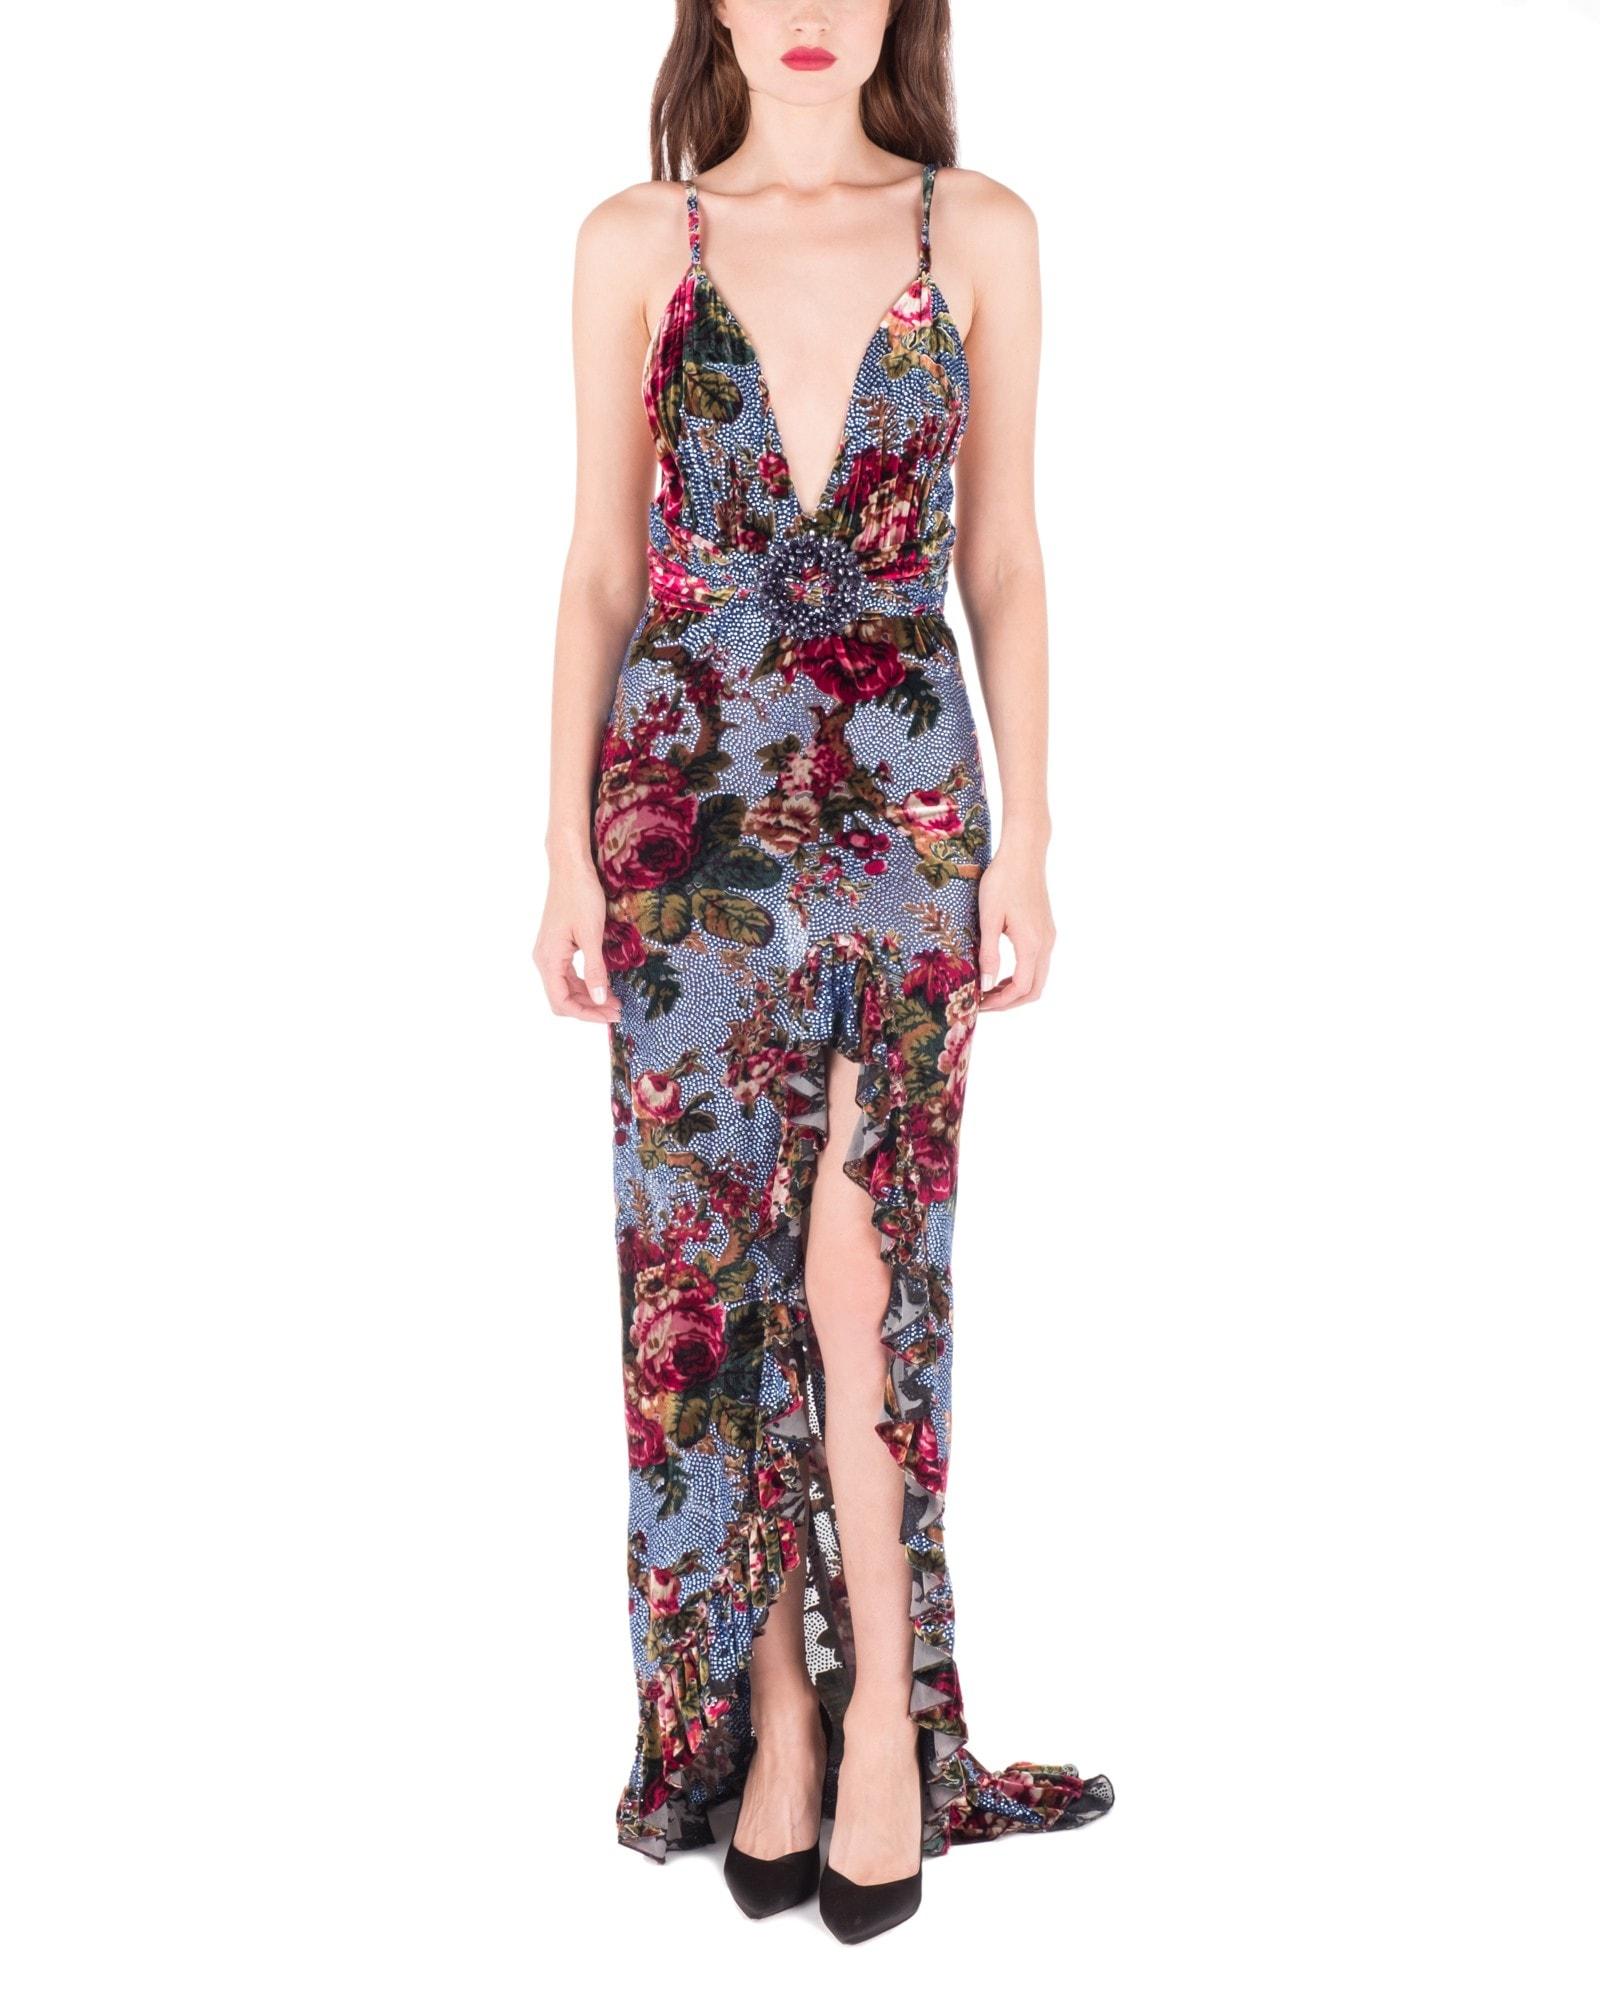 Strass Embellished Velvet Gown